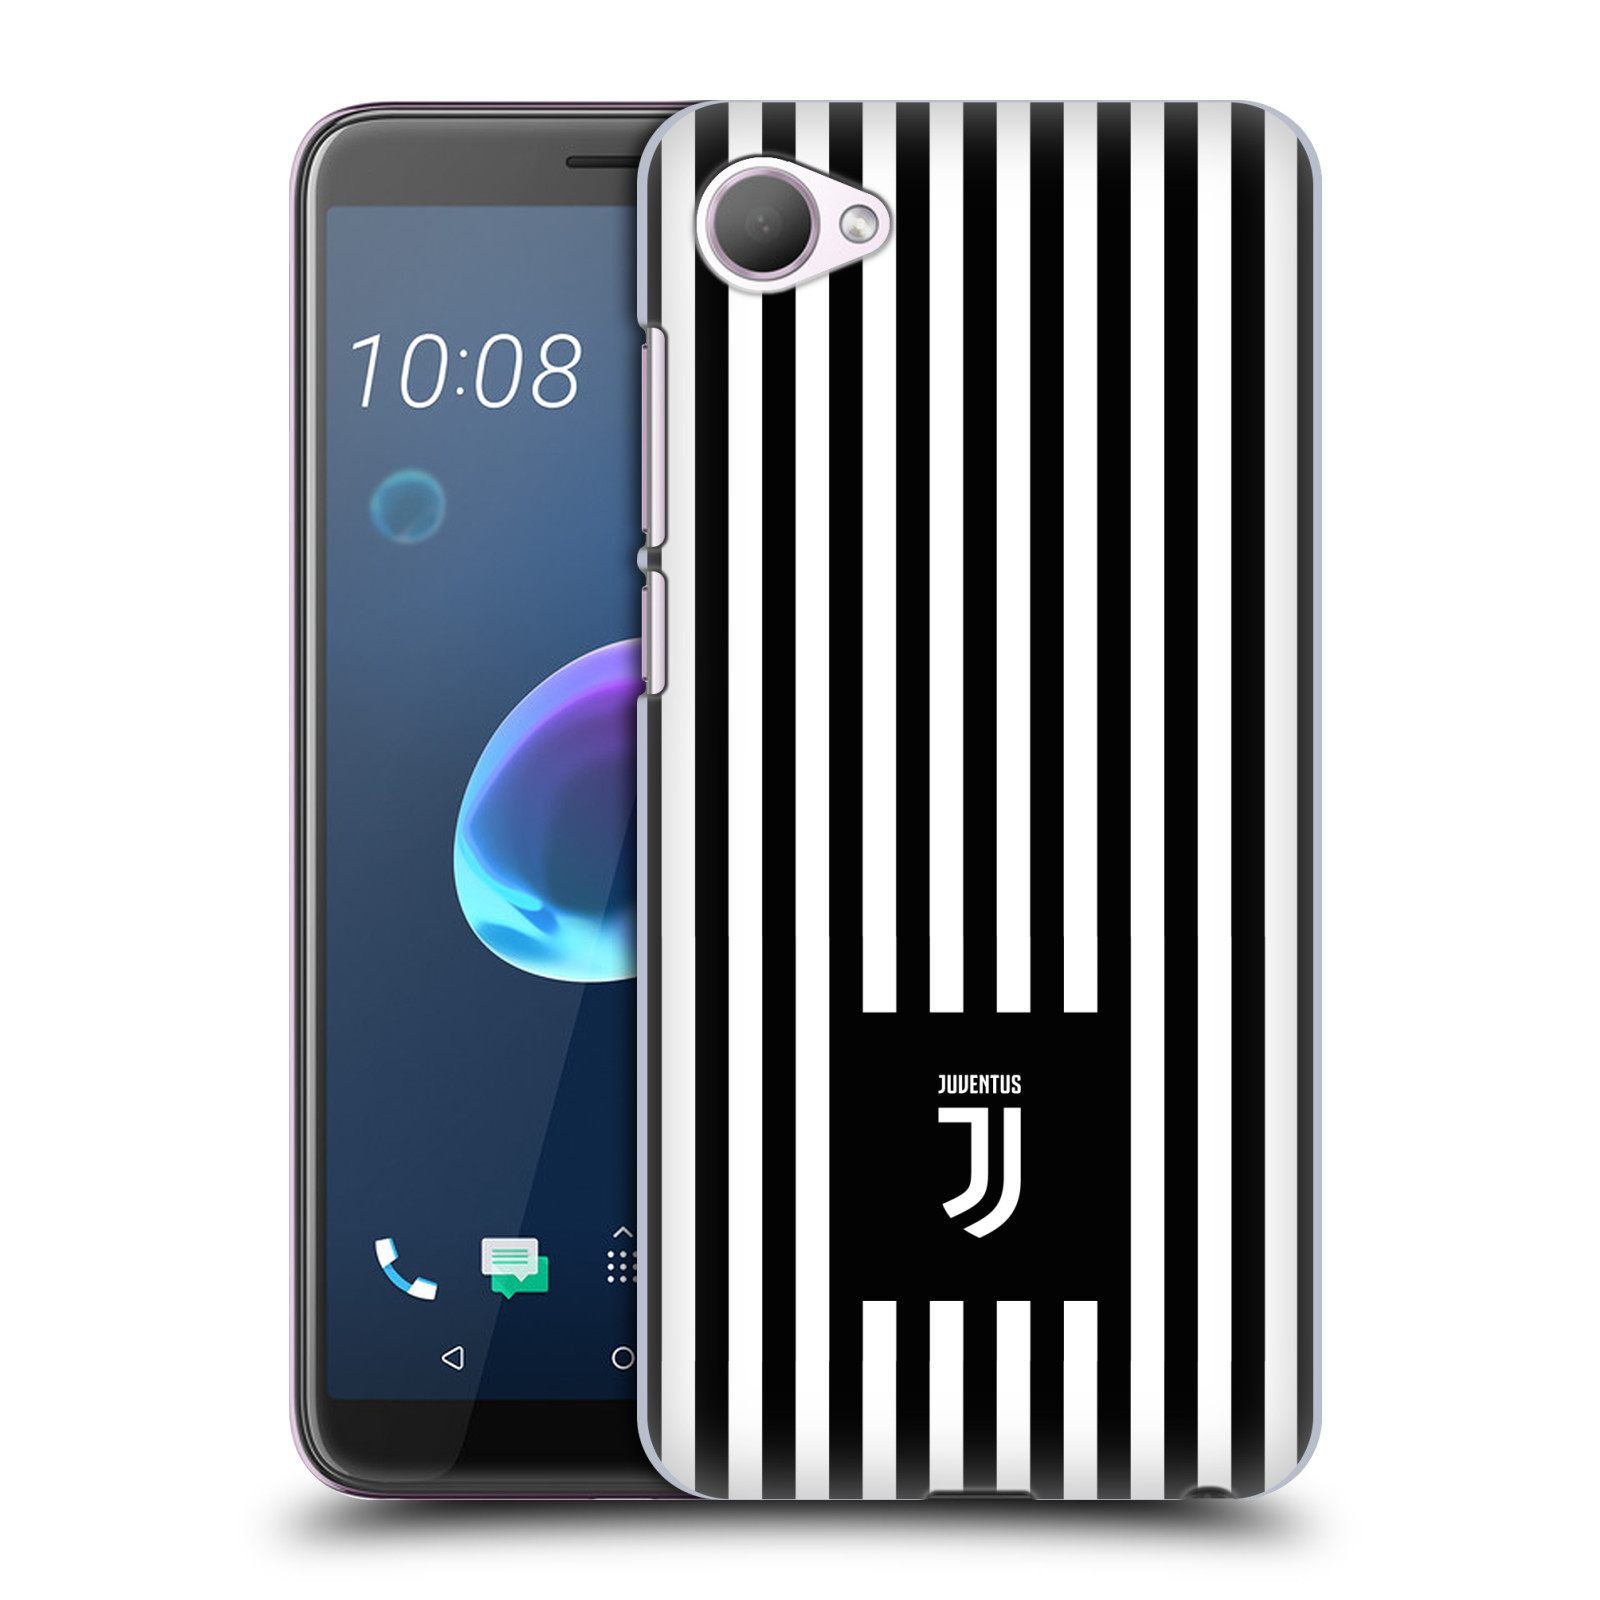 Plastové pouzdro na mobil HTC Desire 12 - Head Case - Juventus FC - Nové logo - Pruhy